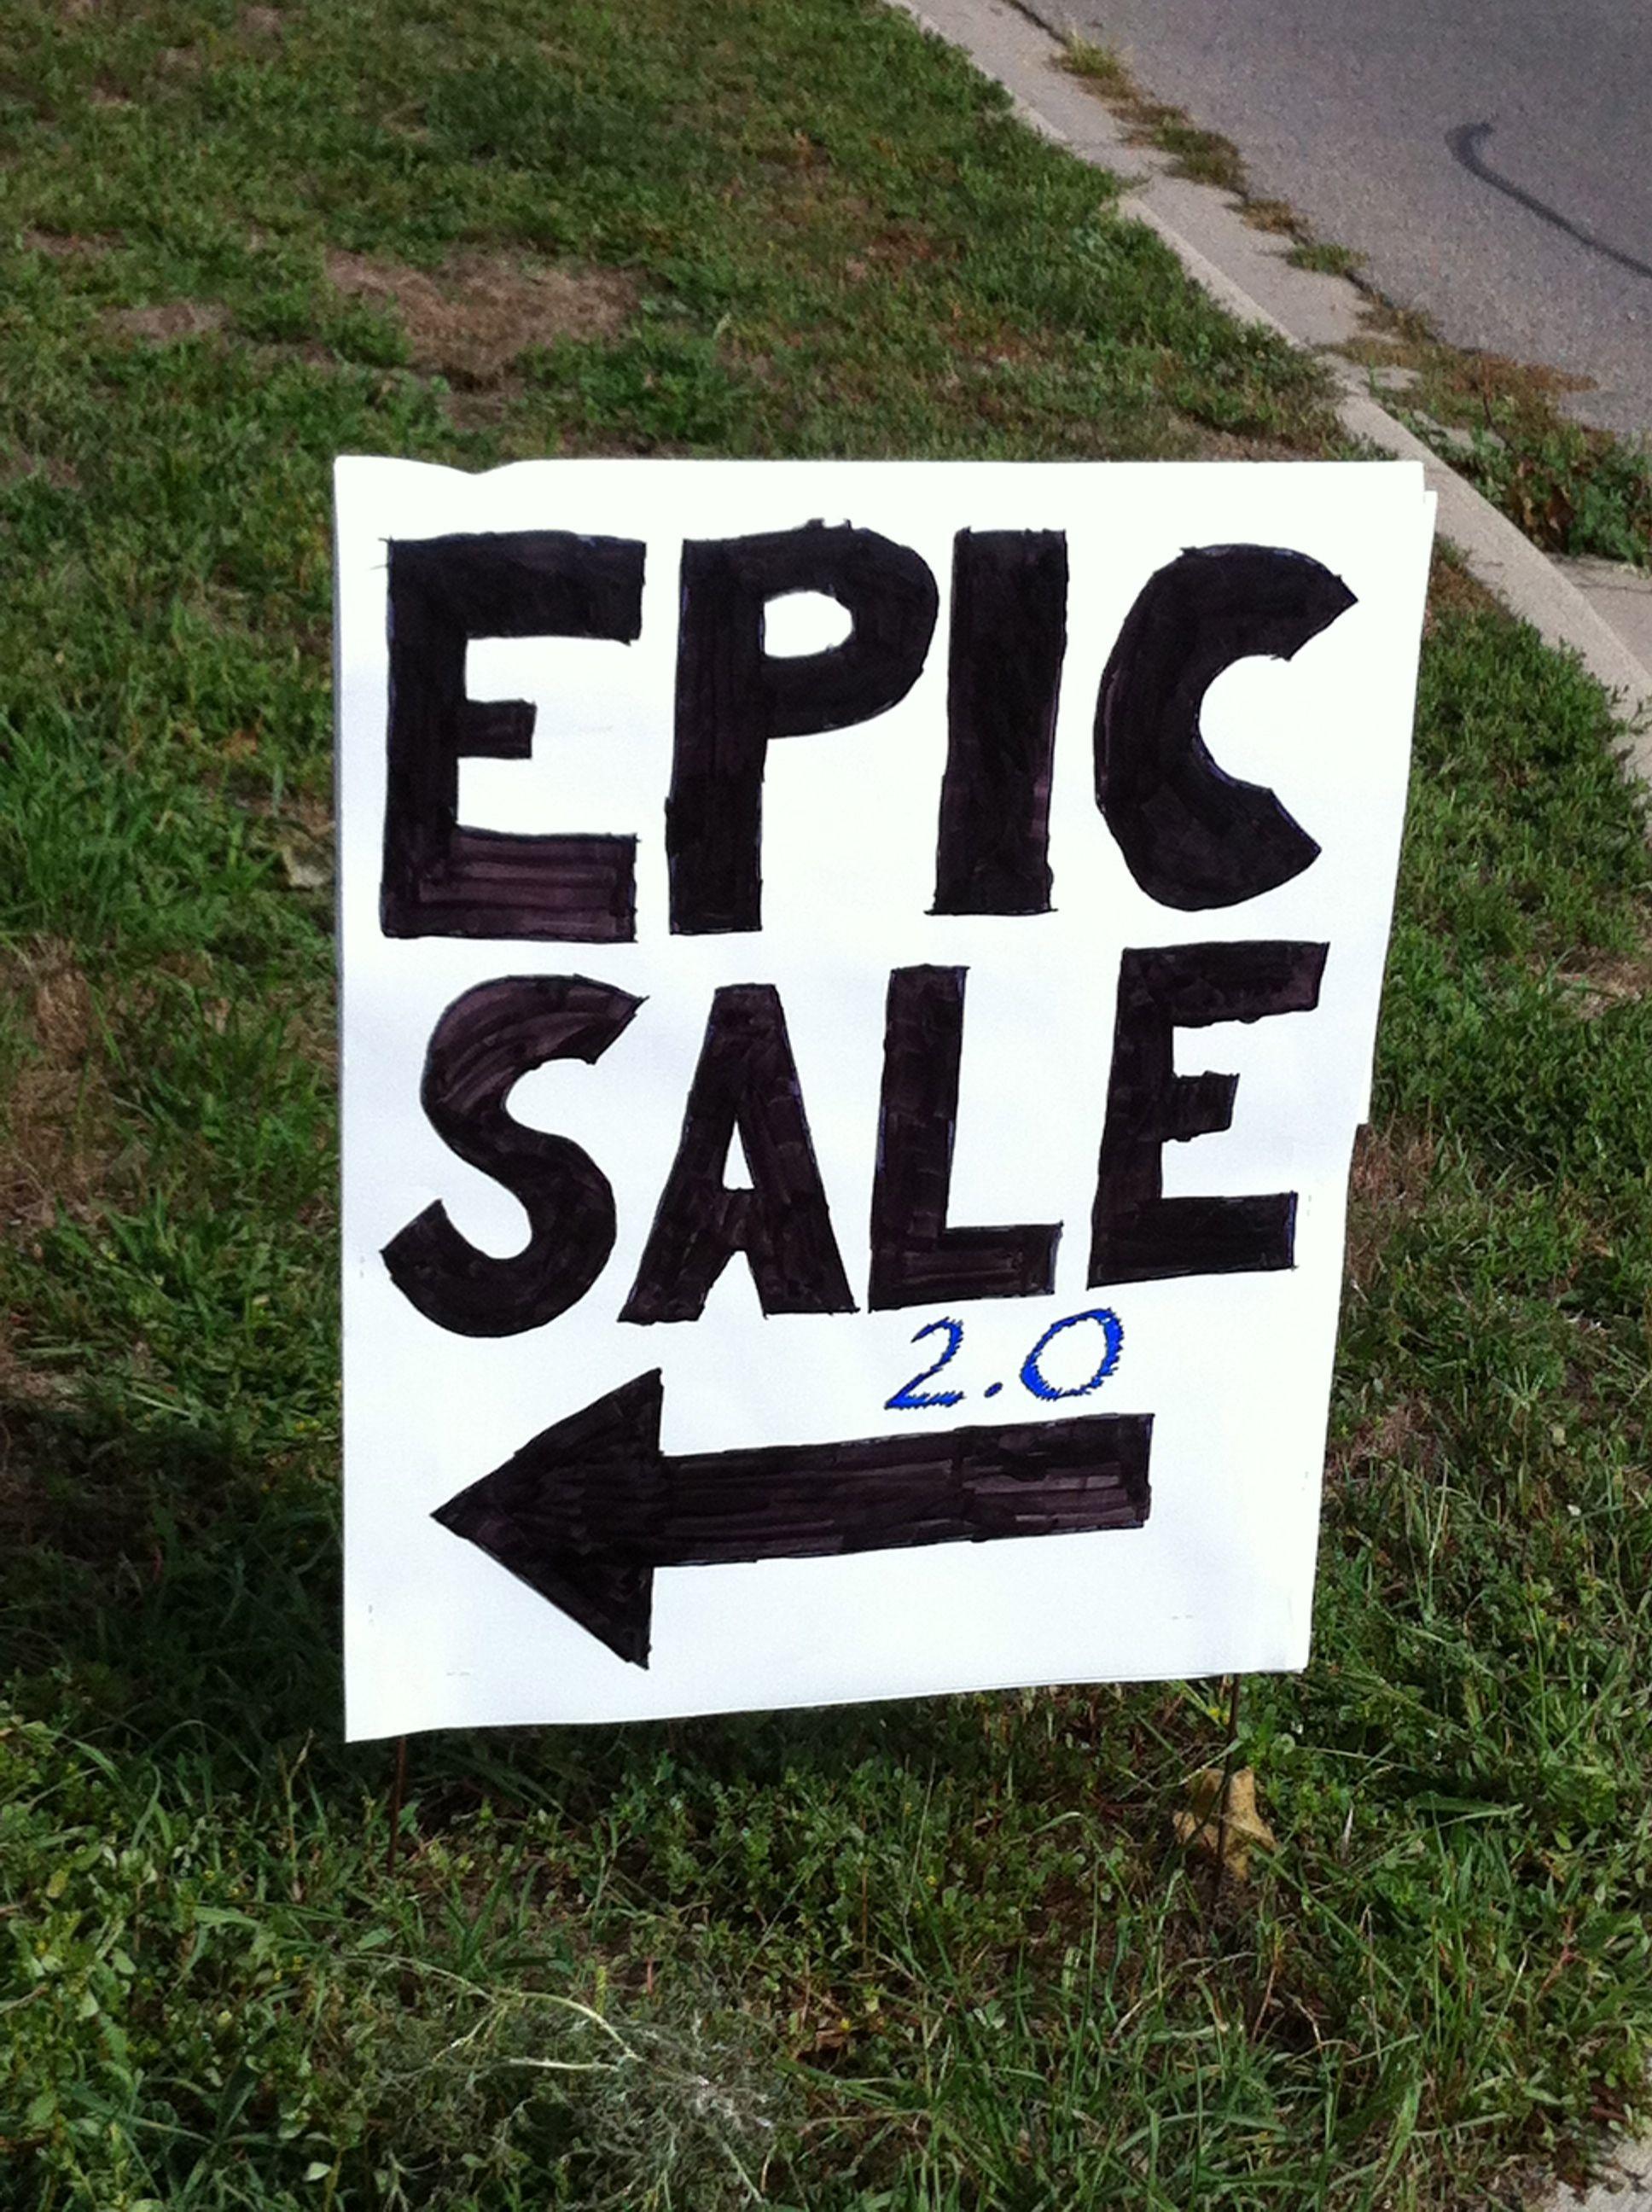 Pin By Gwynn Browne On Linguaphile Garage Sale Signs Yard Sale